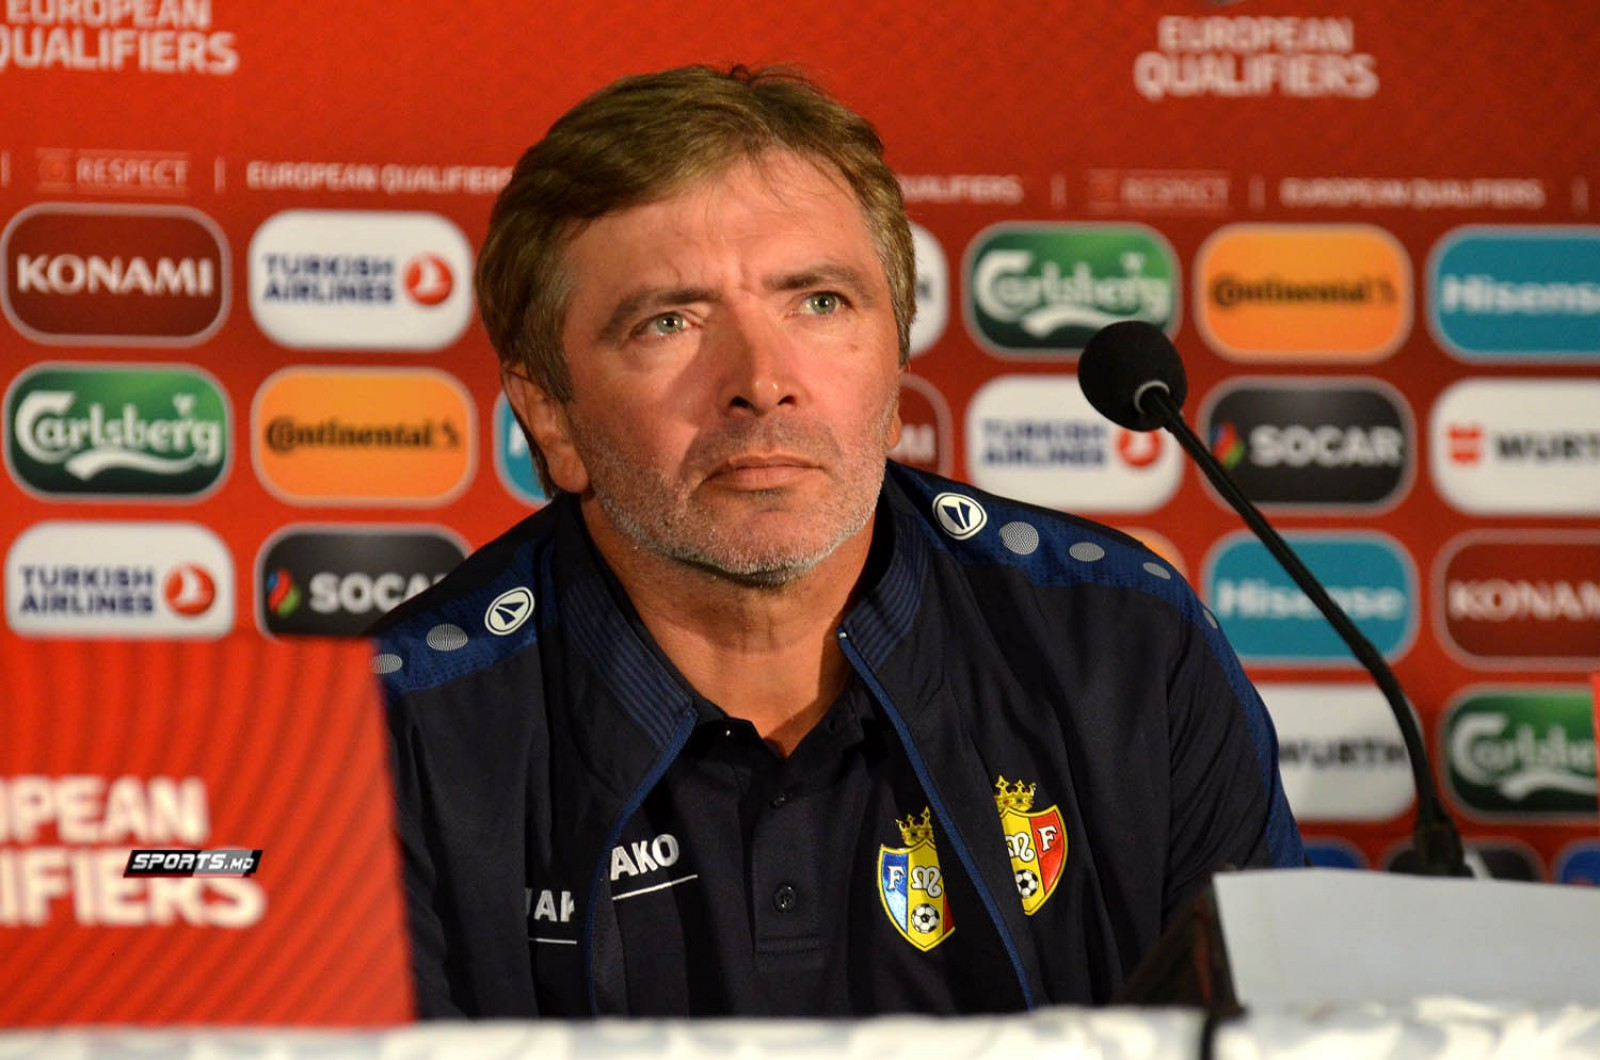 O nouă provocare! Igor Dobrovolschi a devenit antrenorul echipei Dinamo-Auto